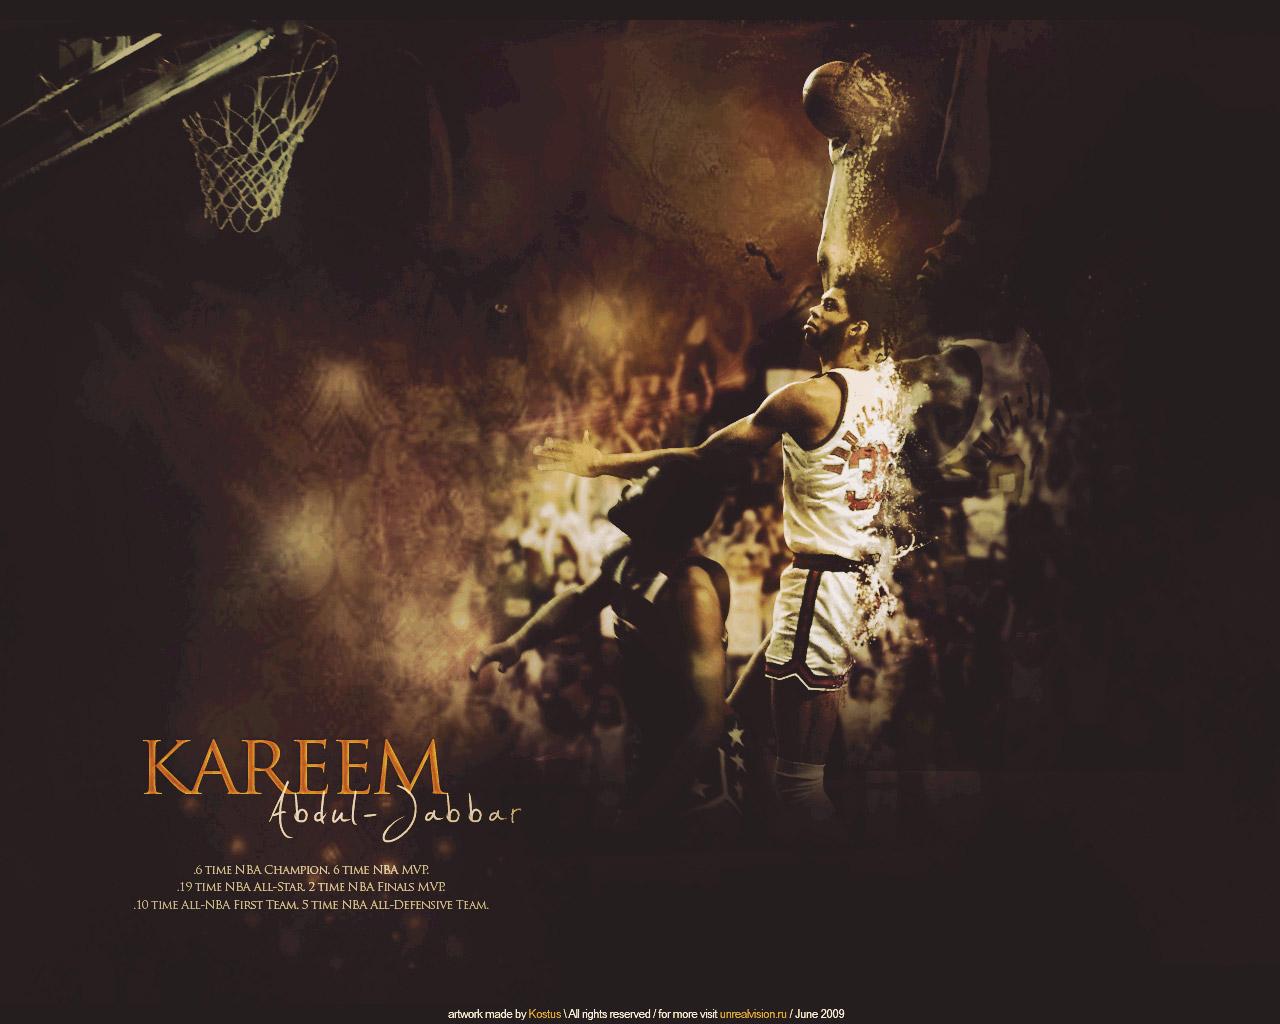 http://2.bp.blogspot.com/-D9FahAgkpho/TmScpBjnmYI/AAAAAAAAD7M/CxJO9pmS9FU/s1600/Kareem-Abdul-Jabbar-Skyhook-Wallpaper.jpg